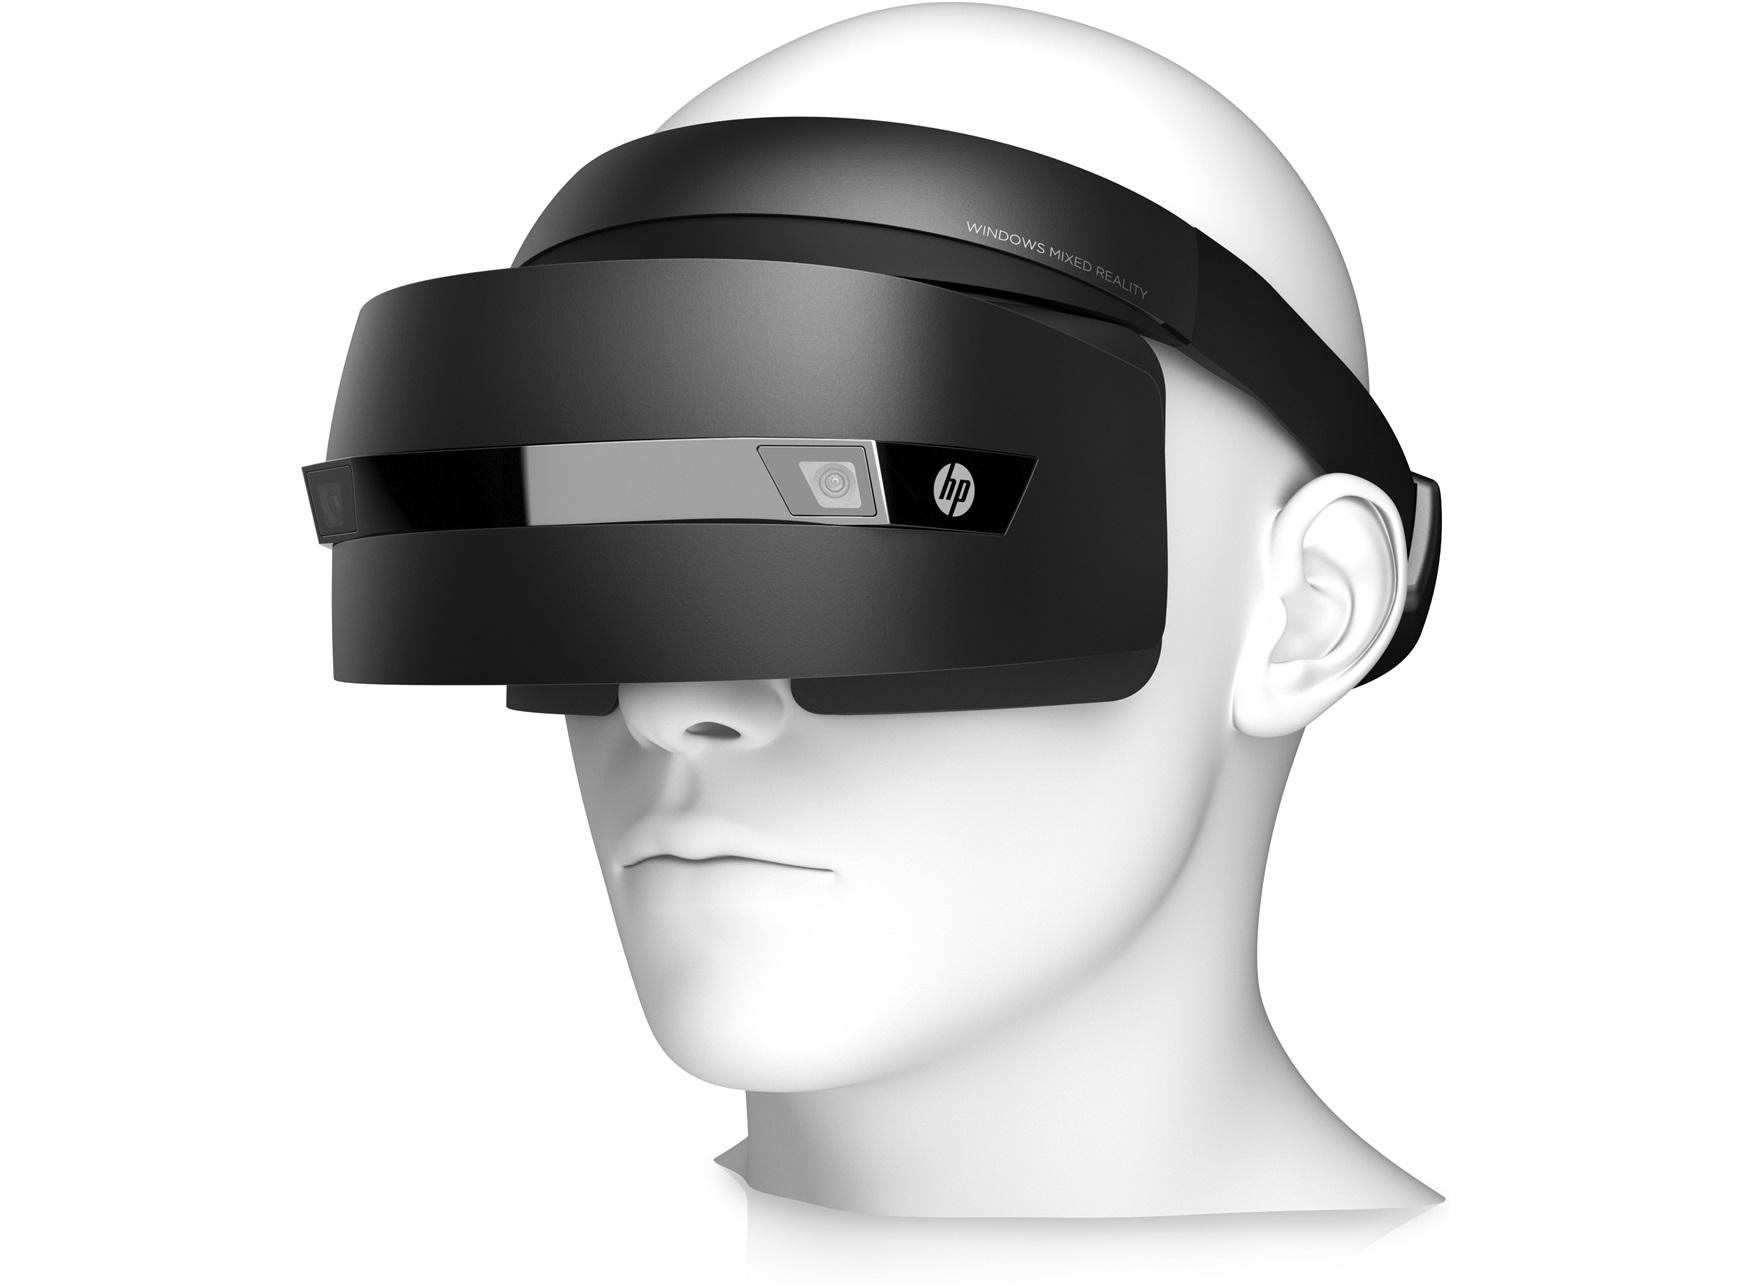 Очки виртуальной реальности HP Windows Mixed Reality Headset